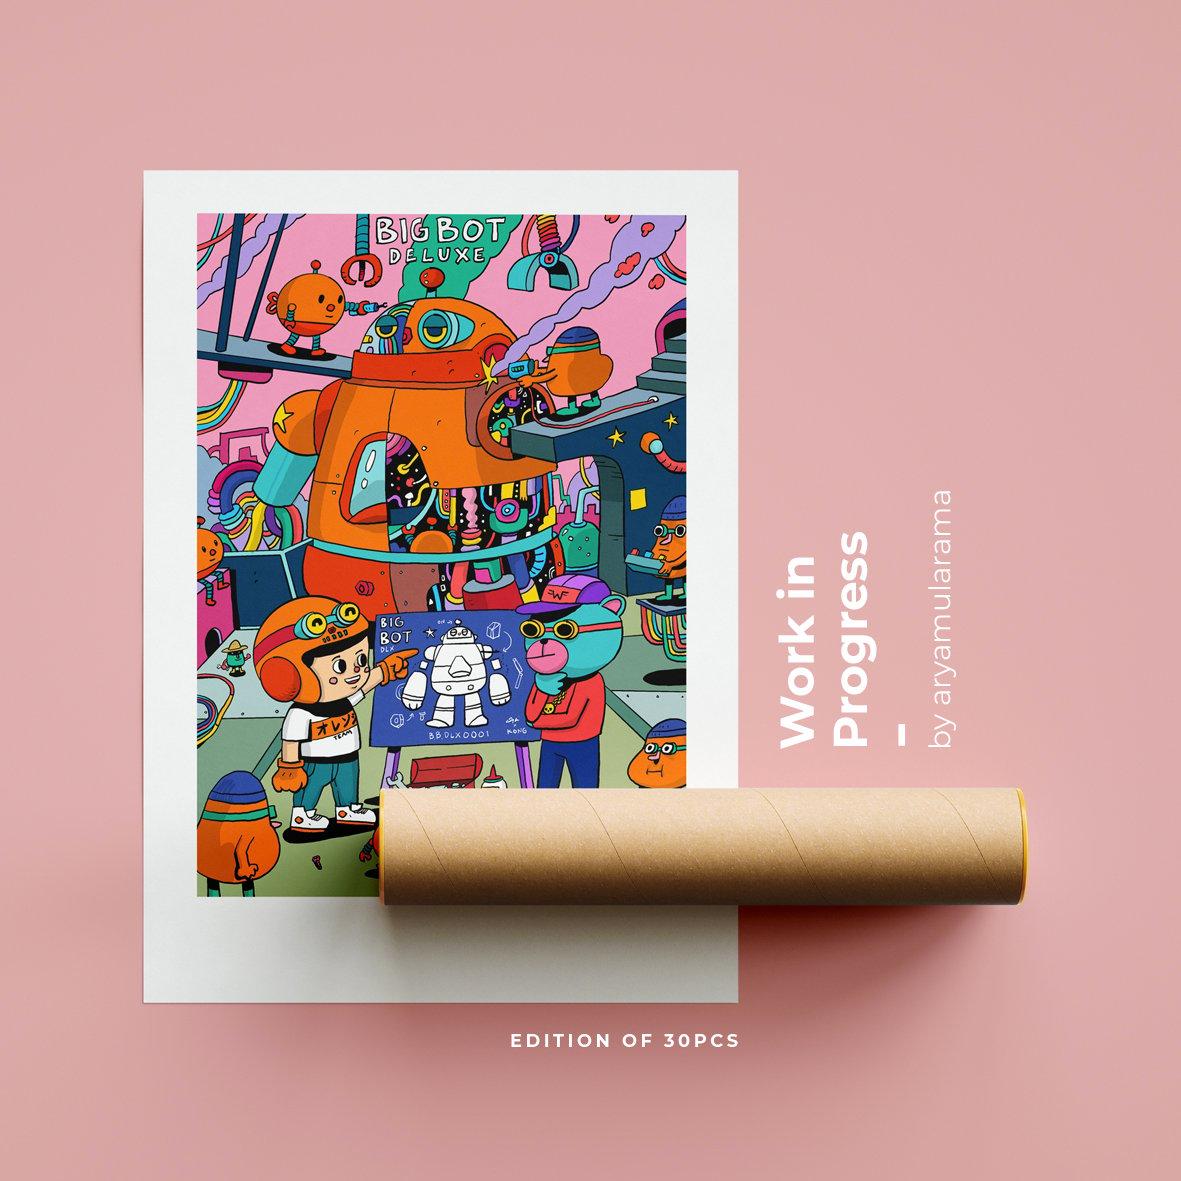 Image of Owange team art print collaboration with Arya mularama